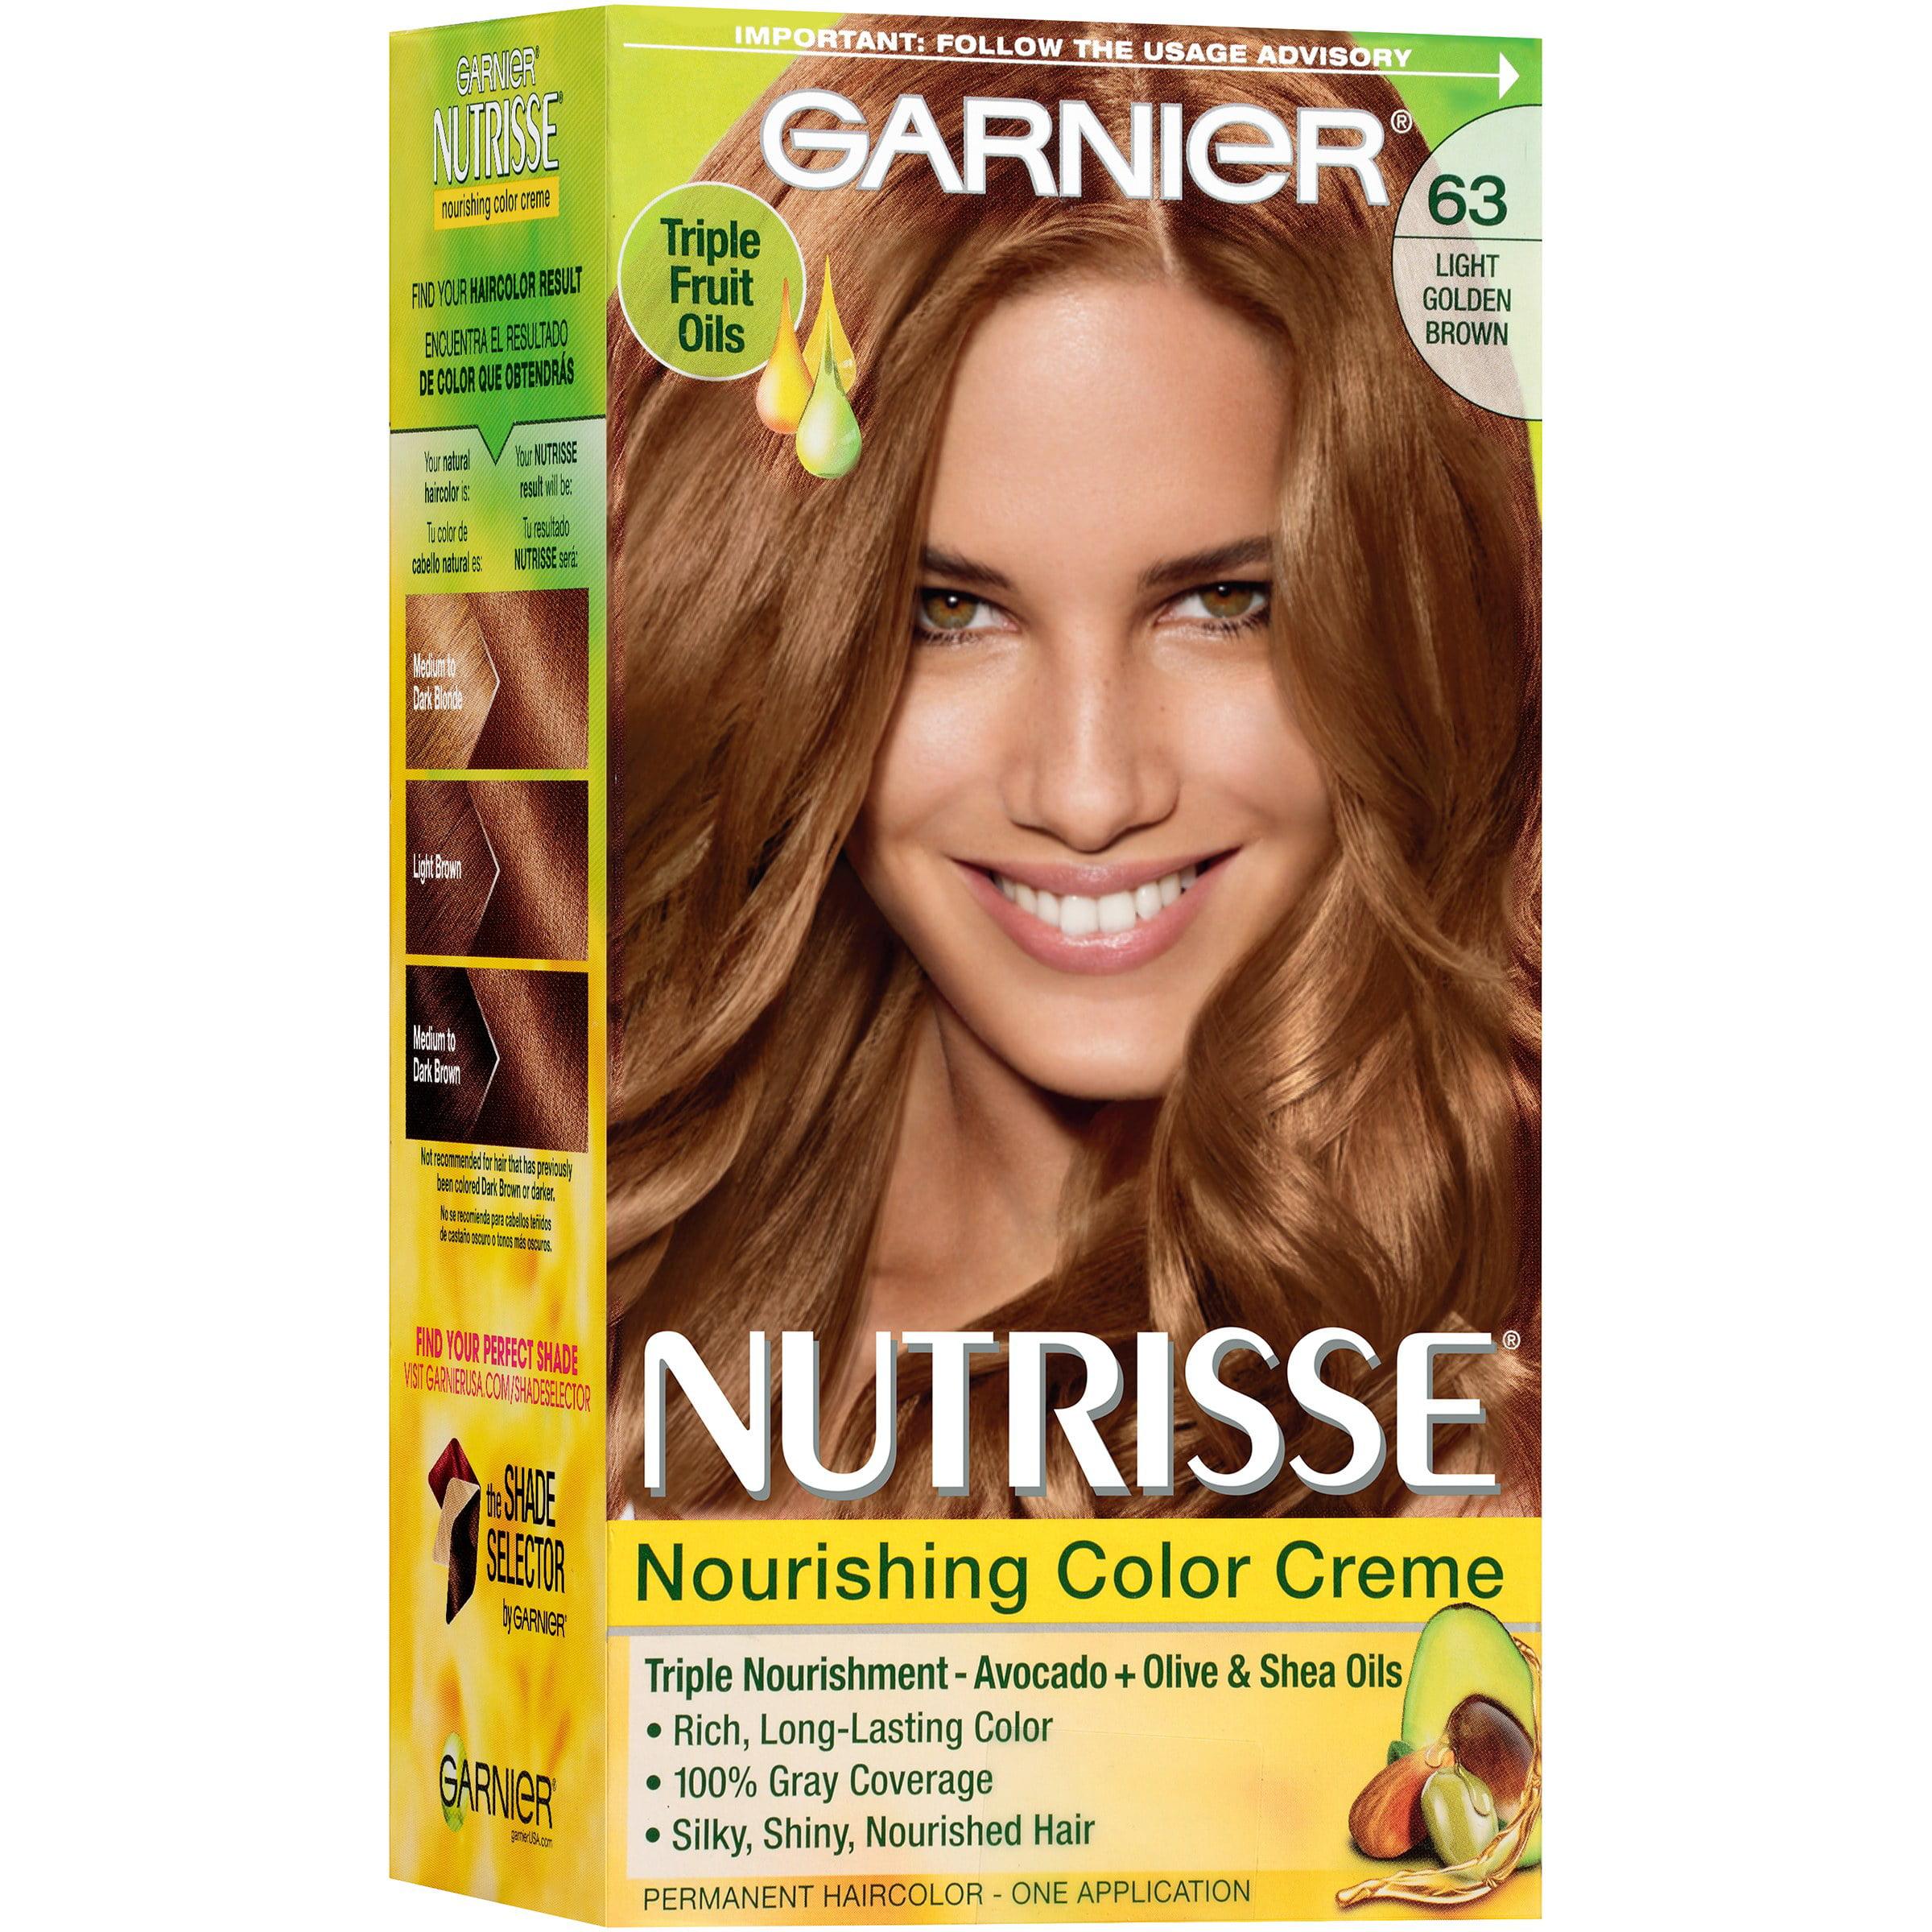 Garnier Nutrisse Nourishing Hair Color Creme Walmart Com